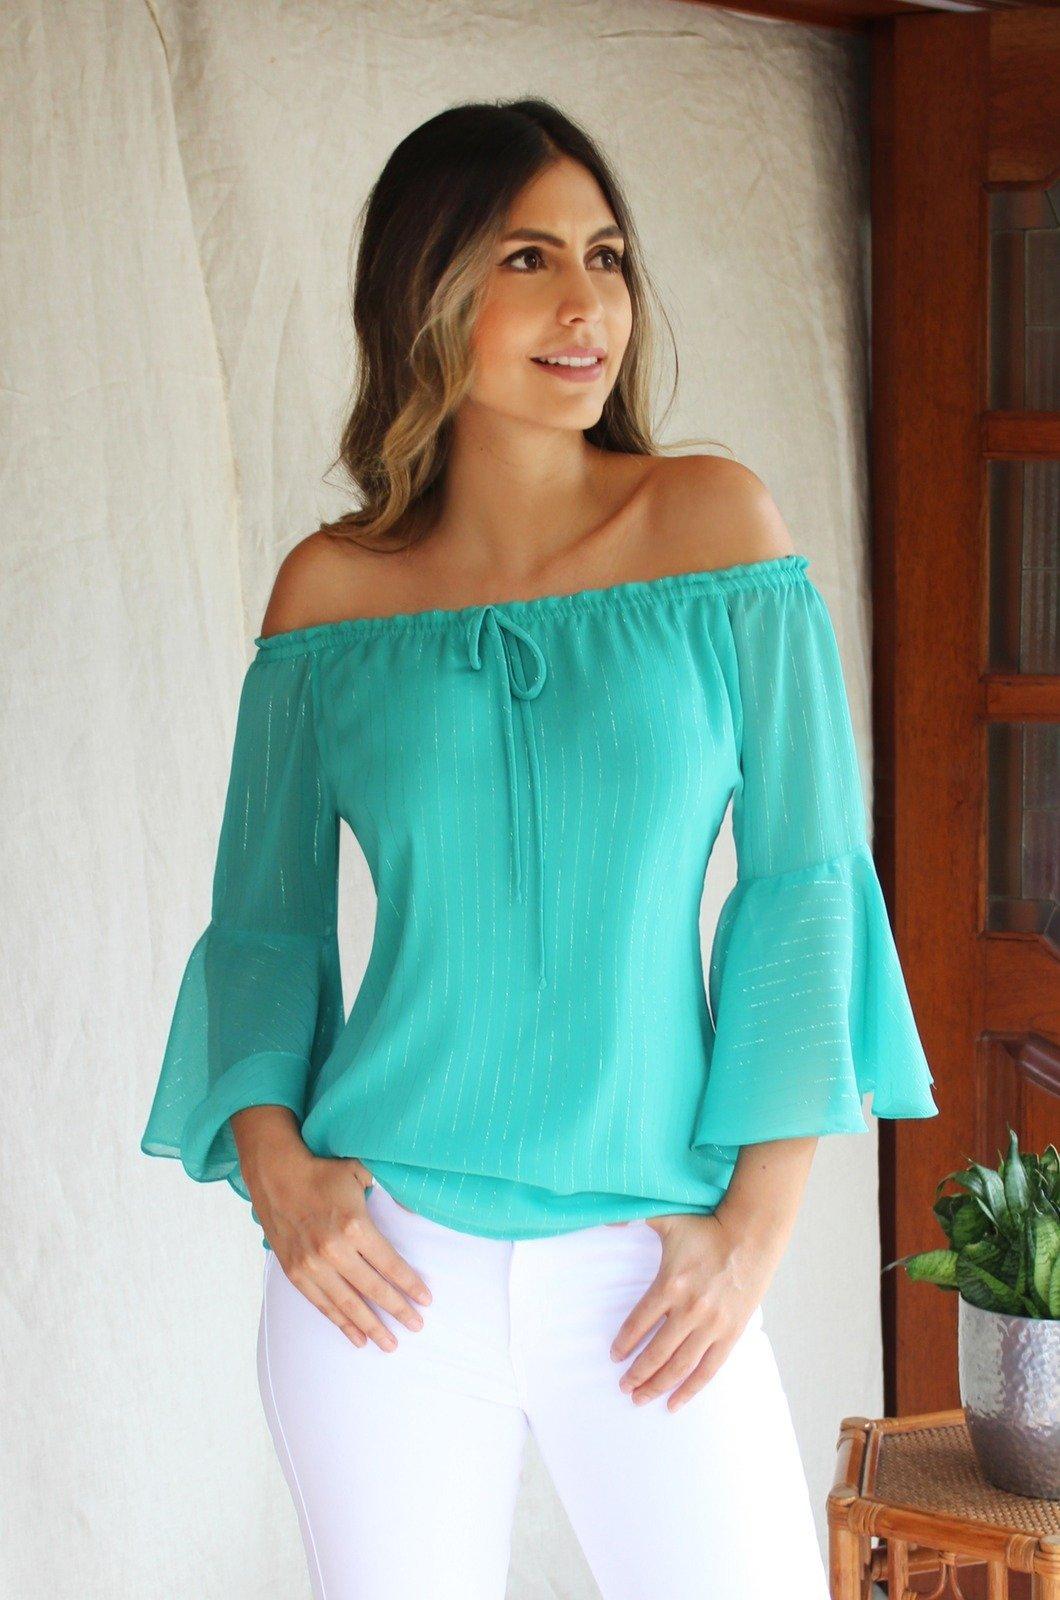 Blusa campesina con bolero en manga verde - Chazari 4025-20 verde